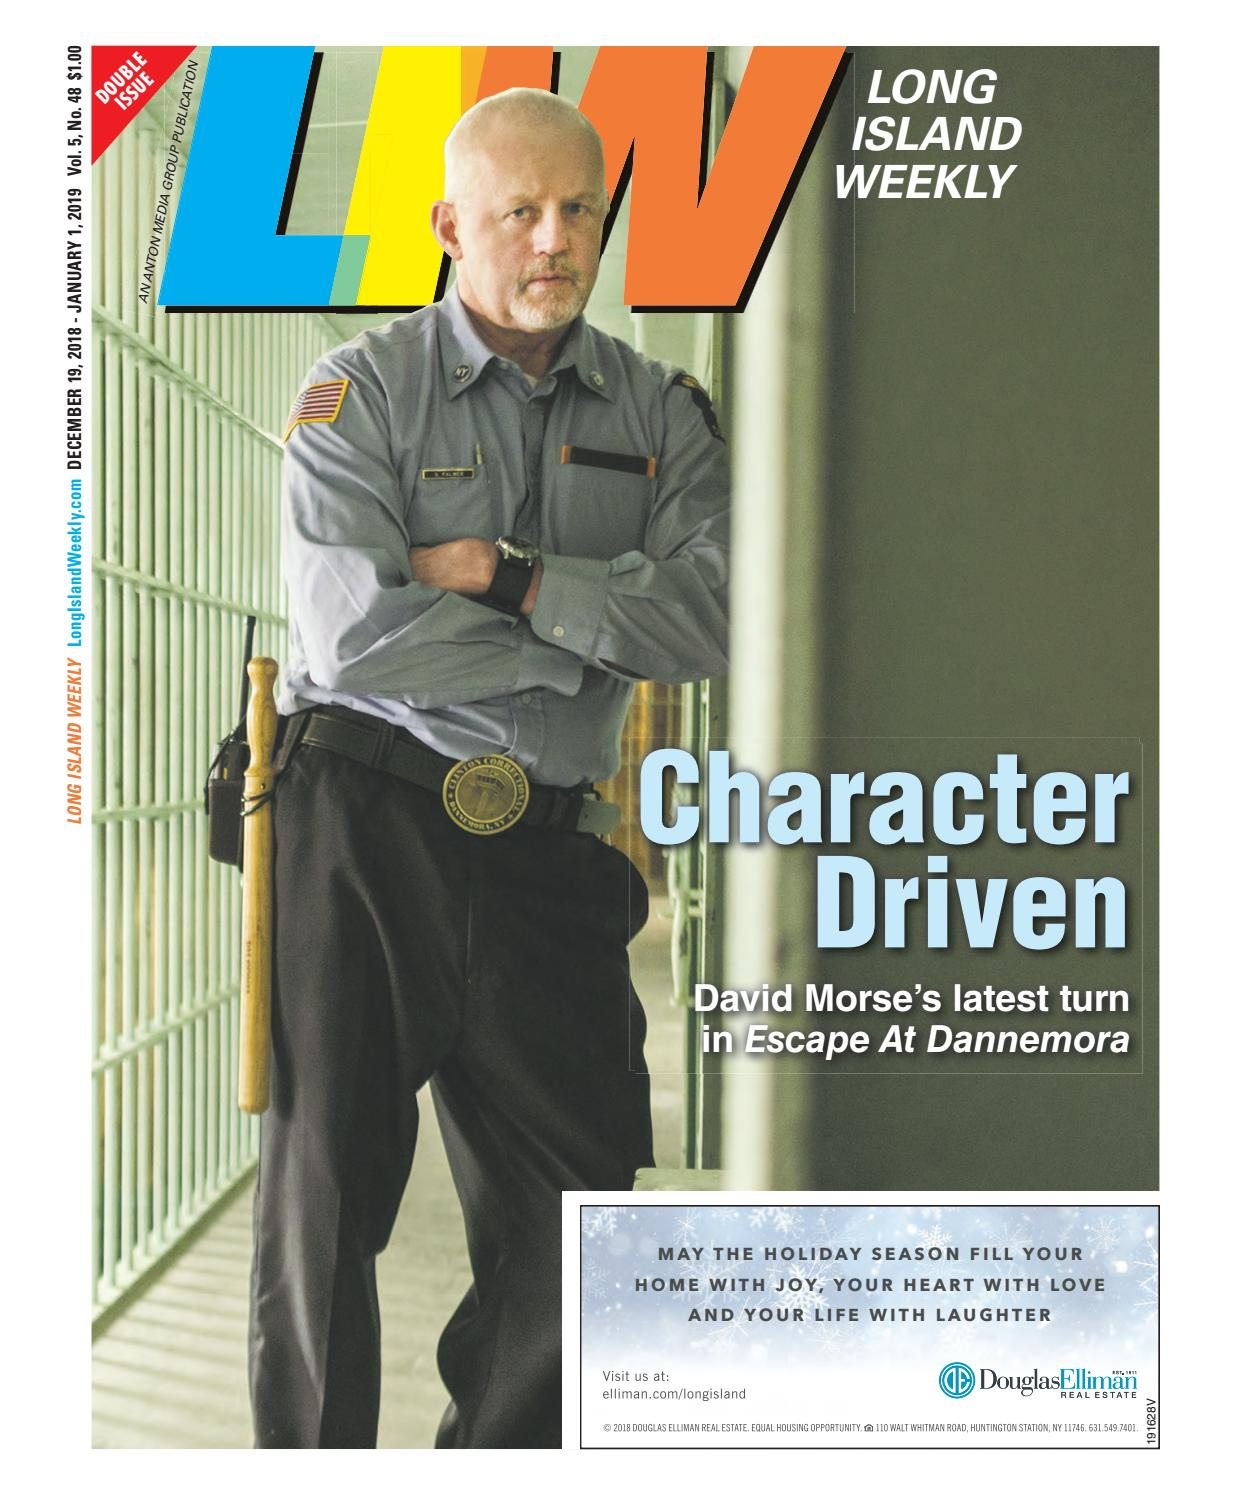 aaa75e192426b Long Island Weekly 12-19-18 by Anton Community Newspapers - issuu